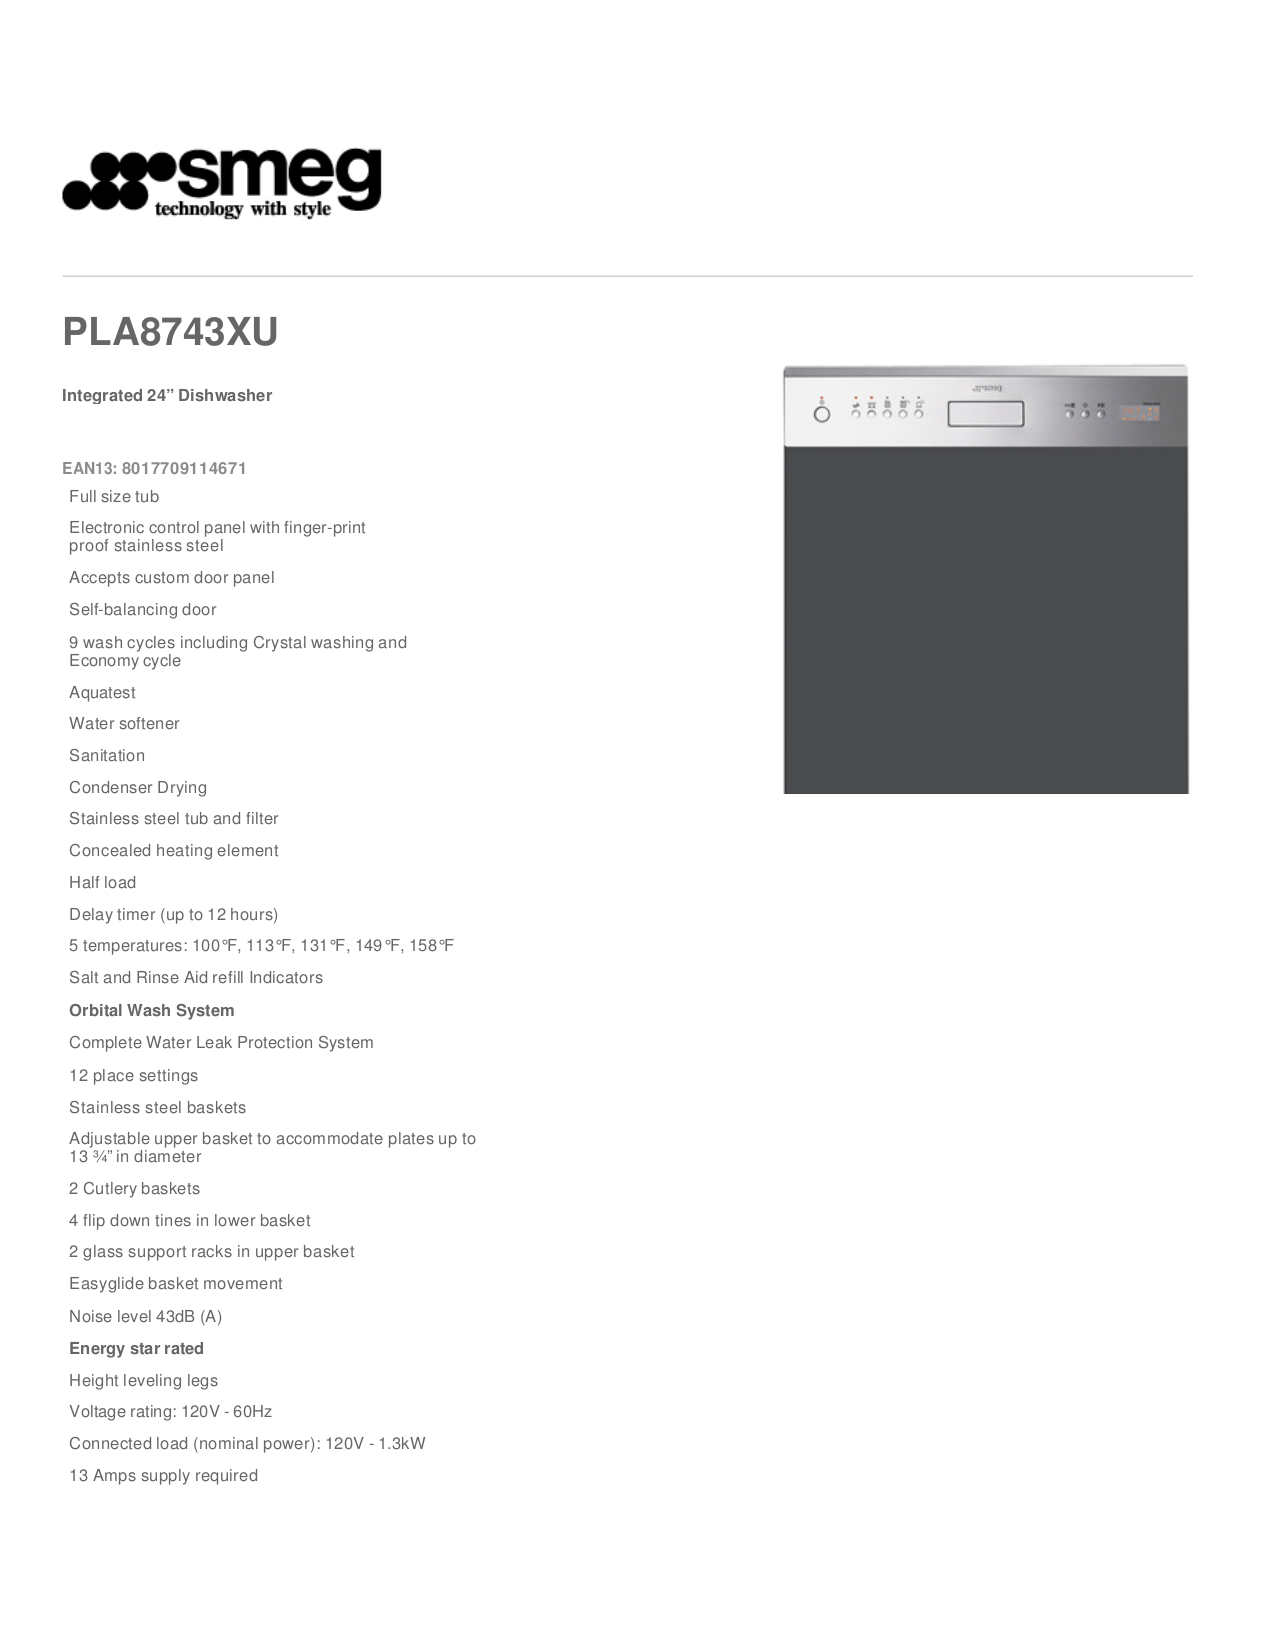 pdf for Smeg Dishwasher PLA8743XU manual